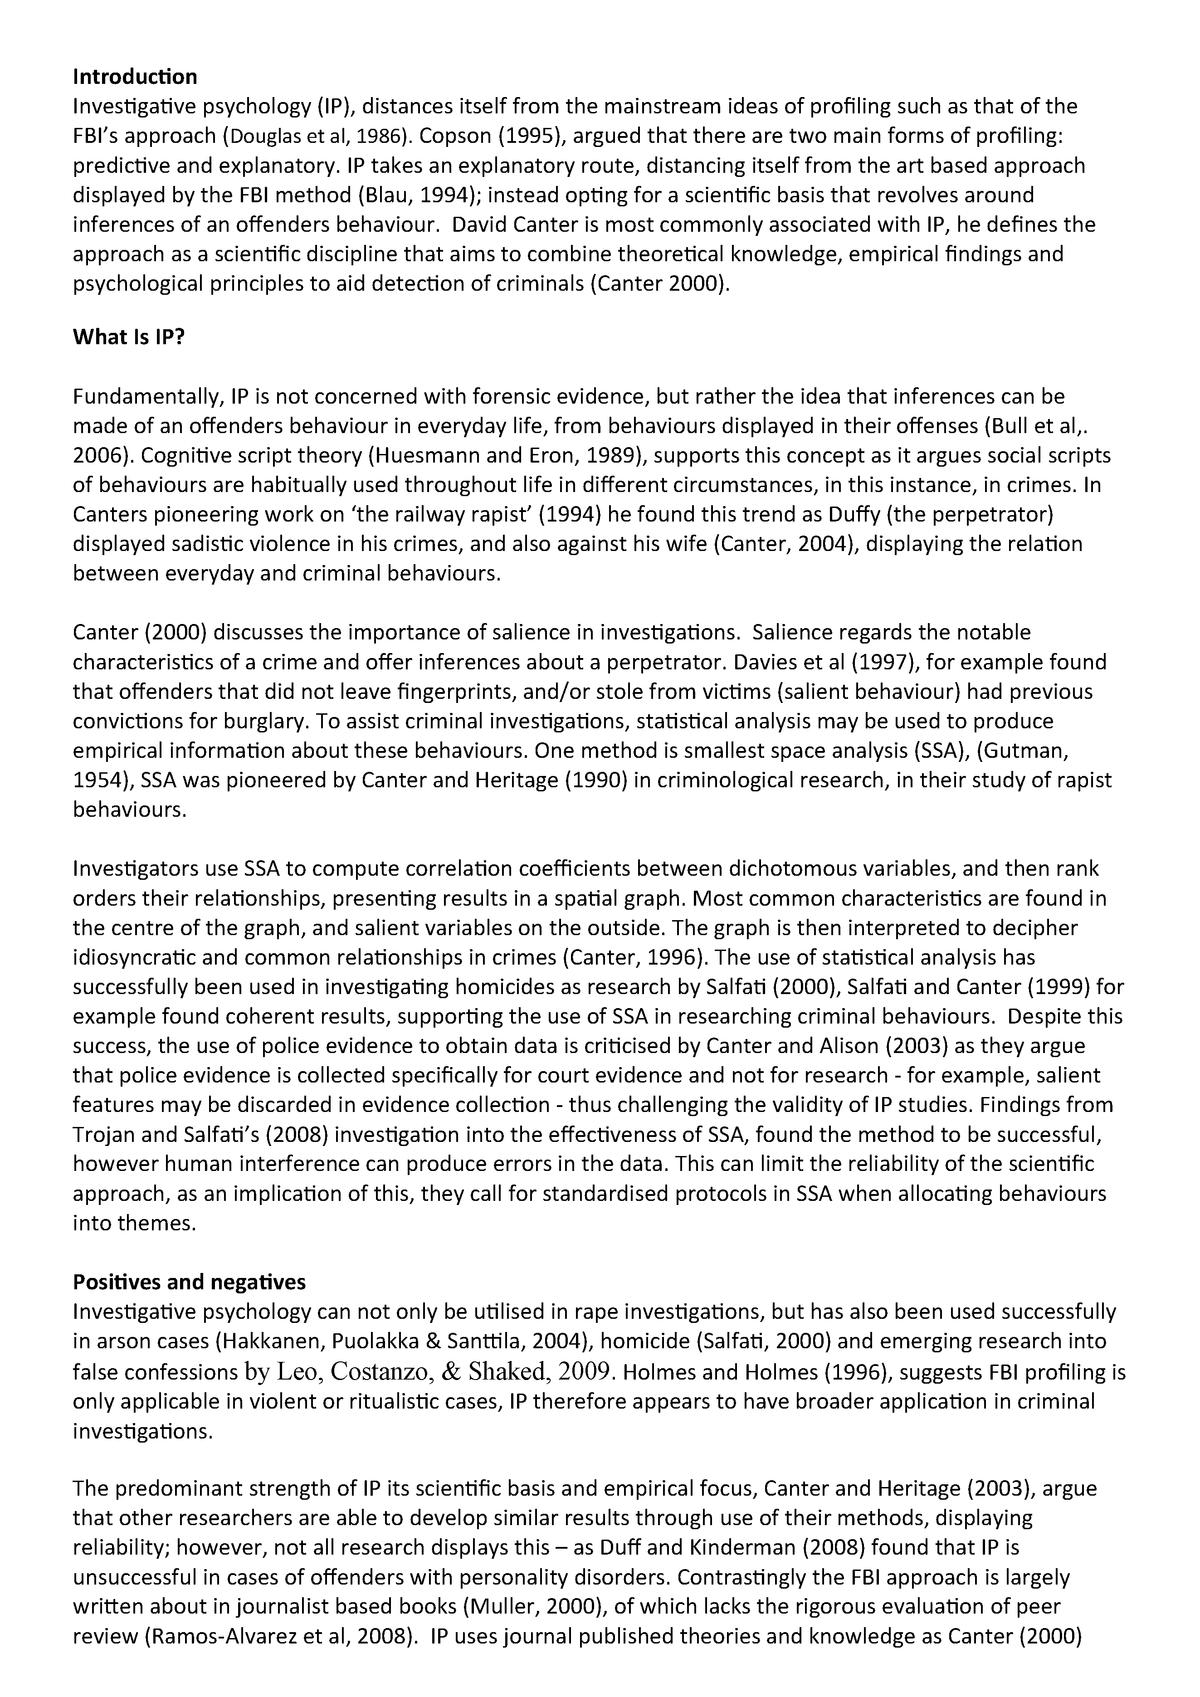 investigative psychology essay - ML95: Bsc Criminology - StuDocu